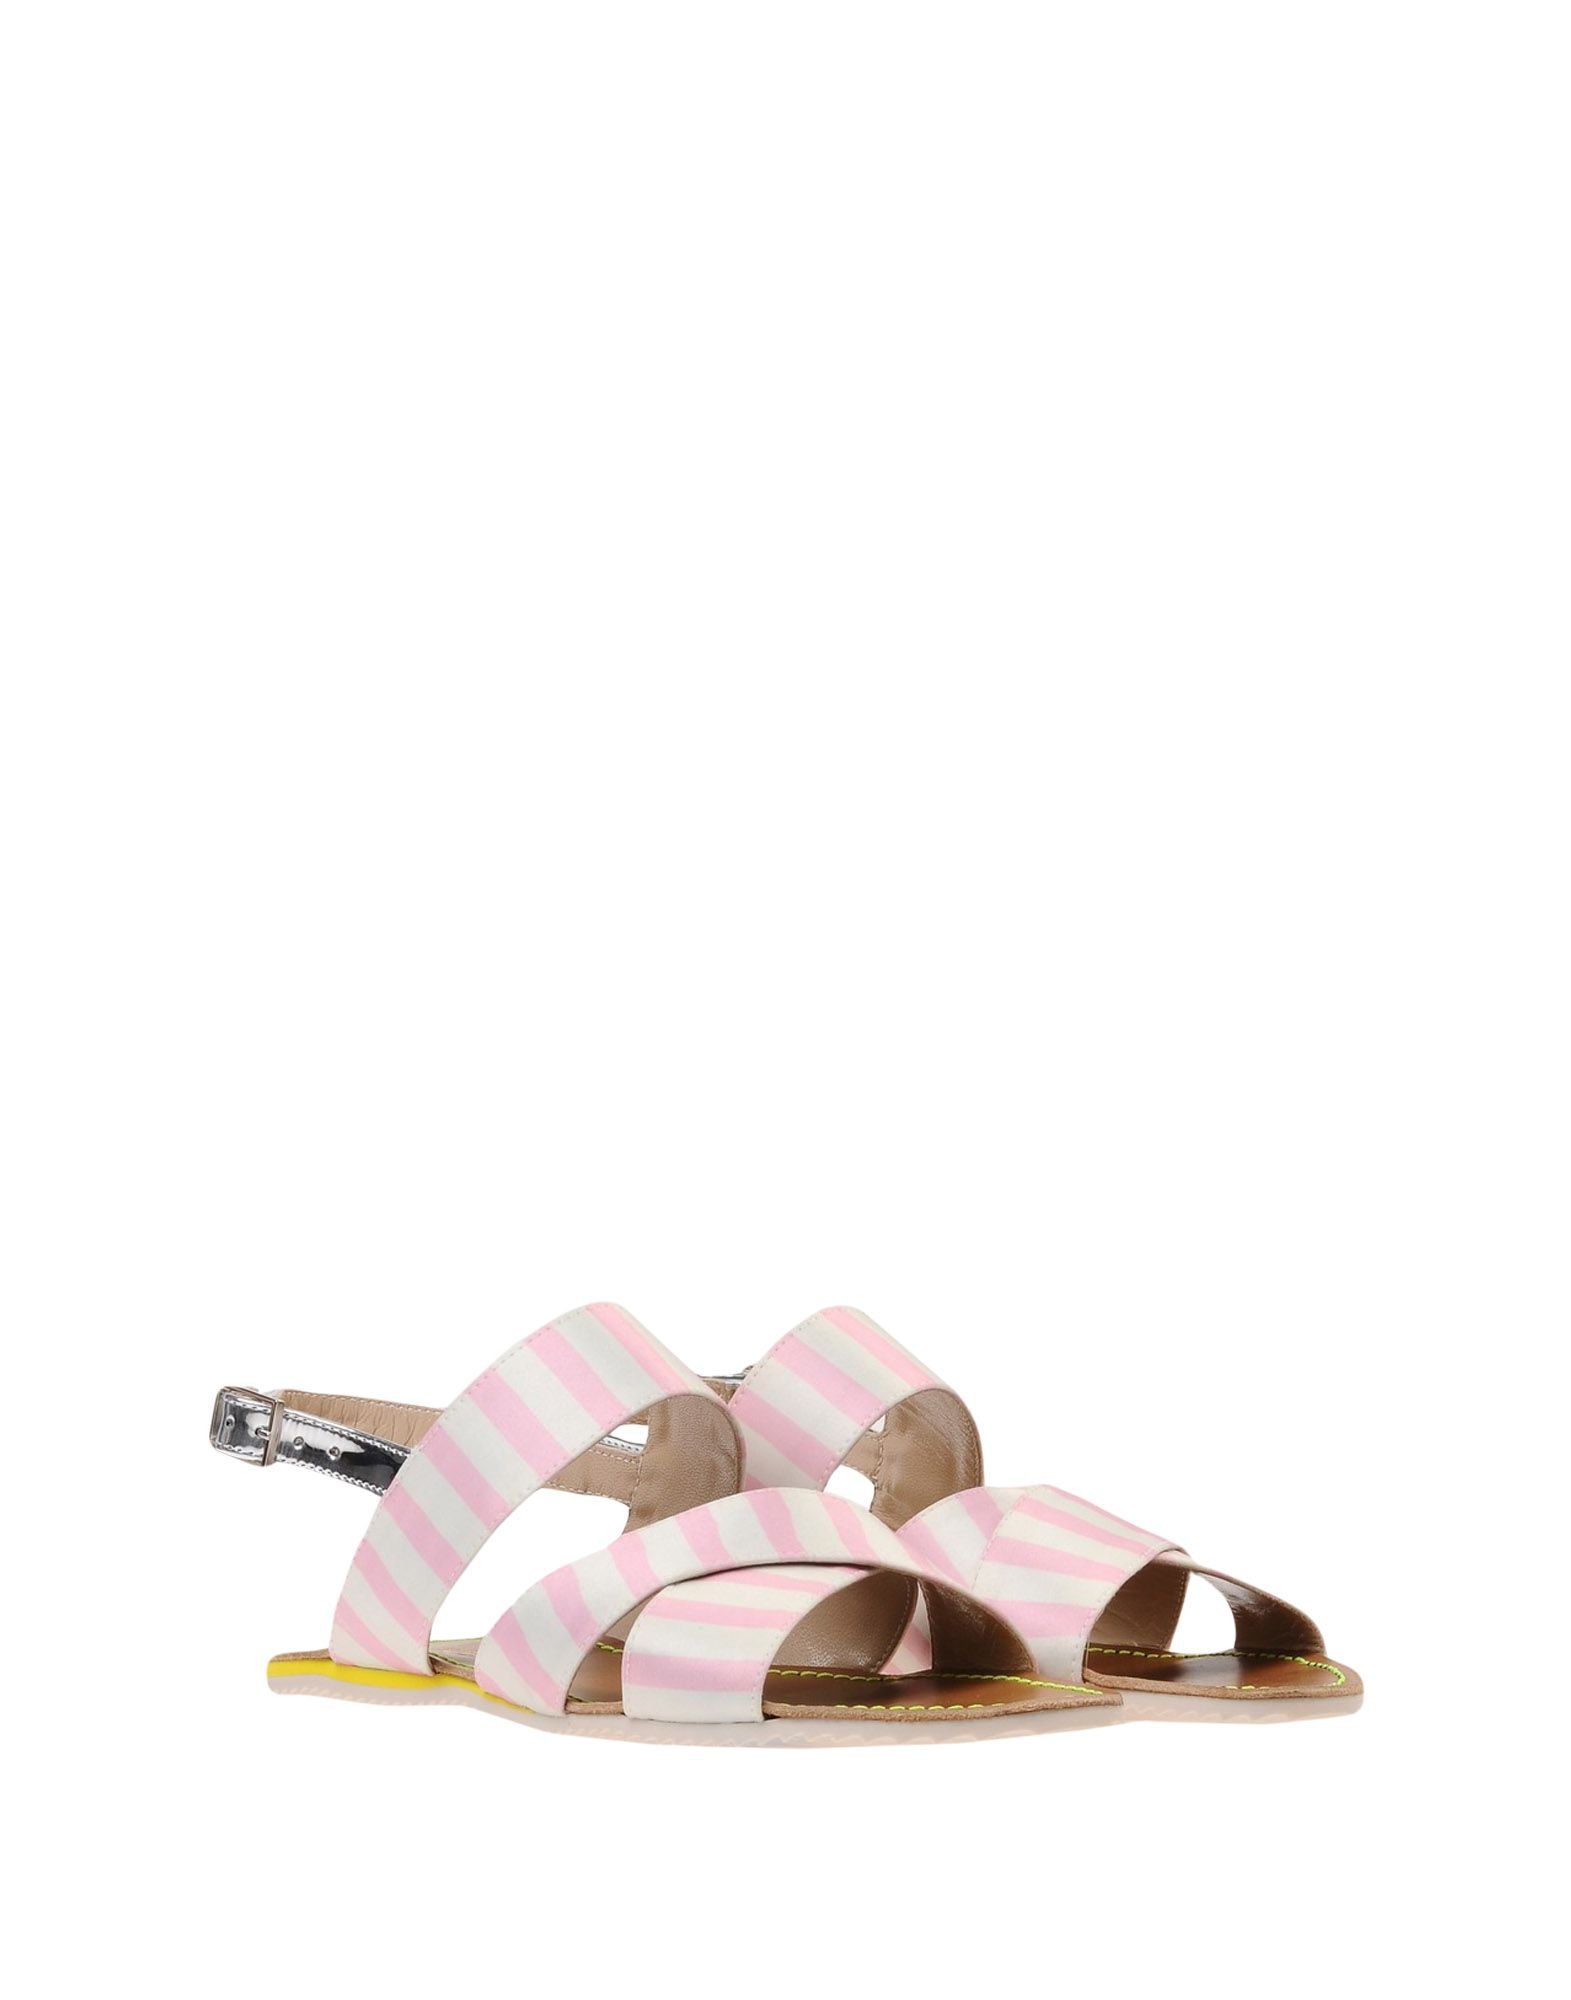 Leo Studio Design Criss Cross Sling Sandal  beliebte 11467219JV Gute Qualität beliebte  Schuhe 103452